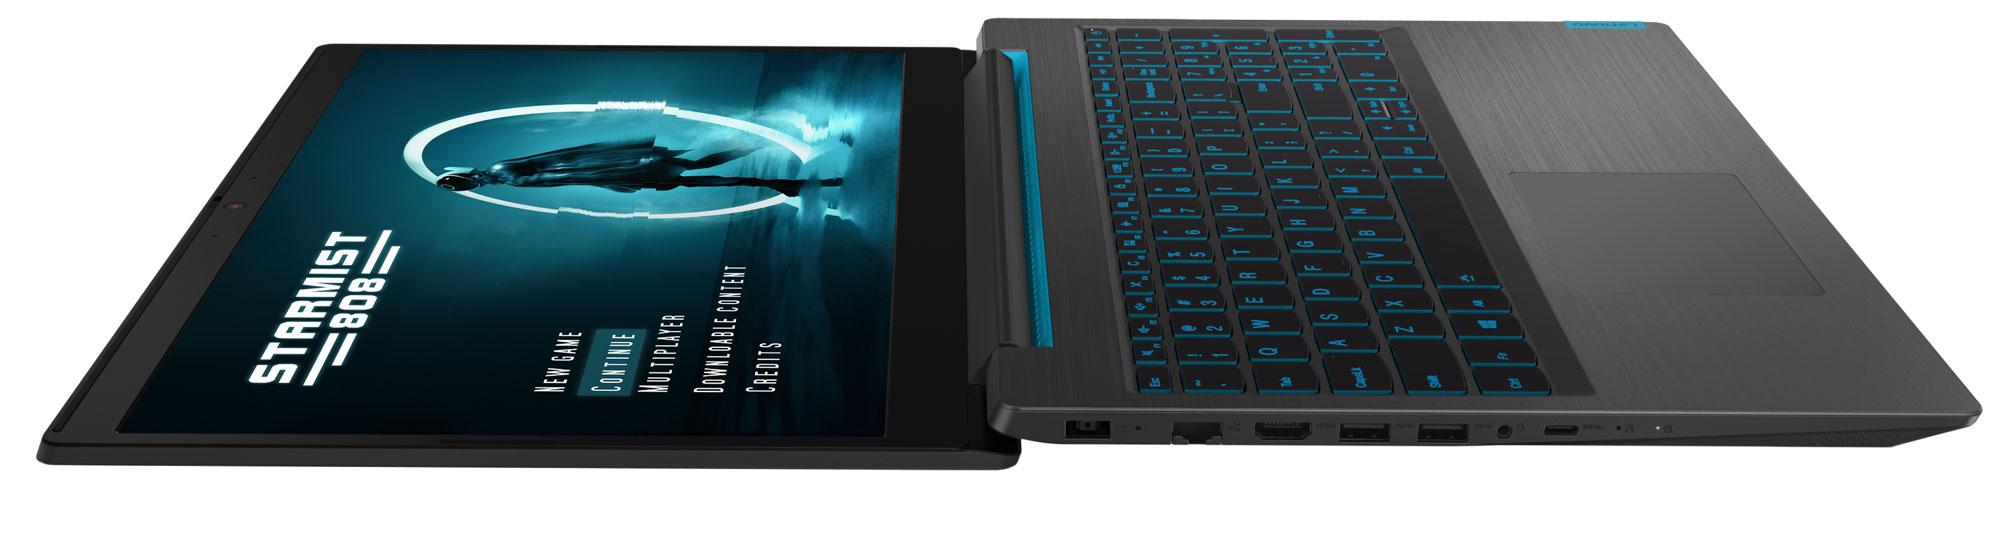 Фото  Ноутбук Lenovo ideapad L340-15IRH Gaming Black (81LK00U0RE)